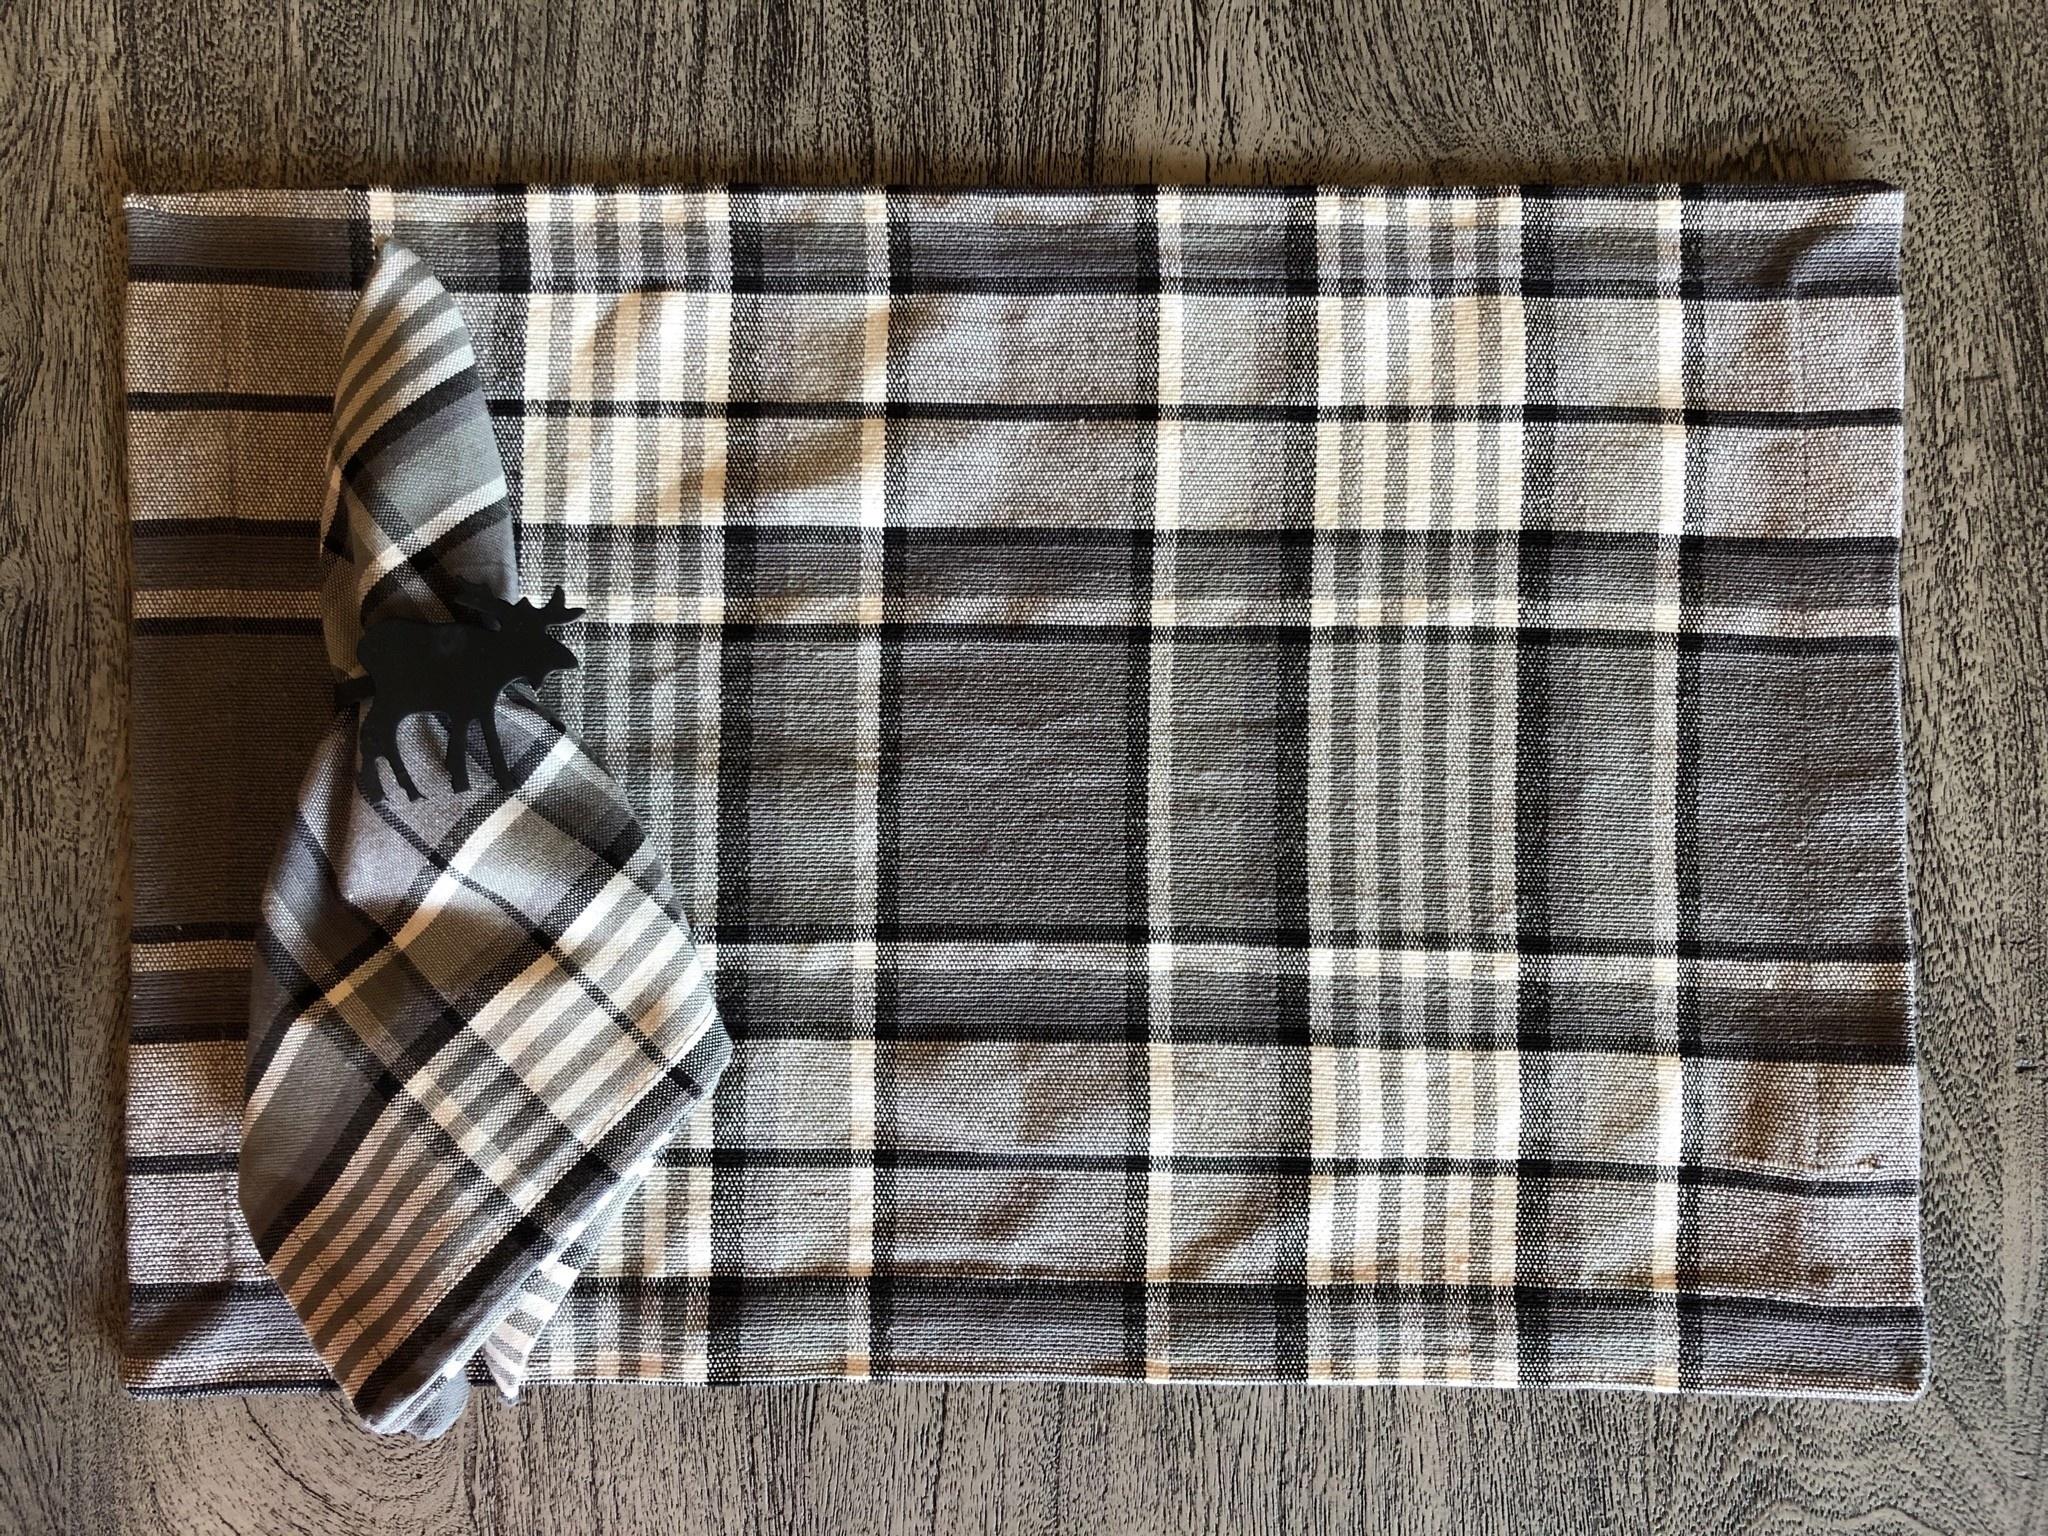 Park Design Linen Napkin